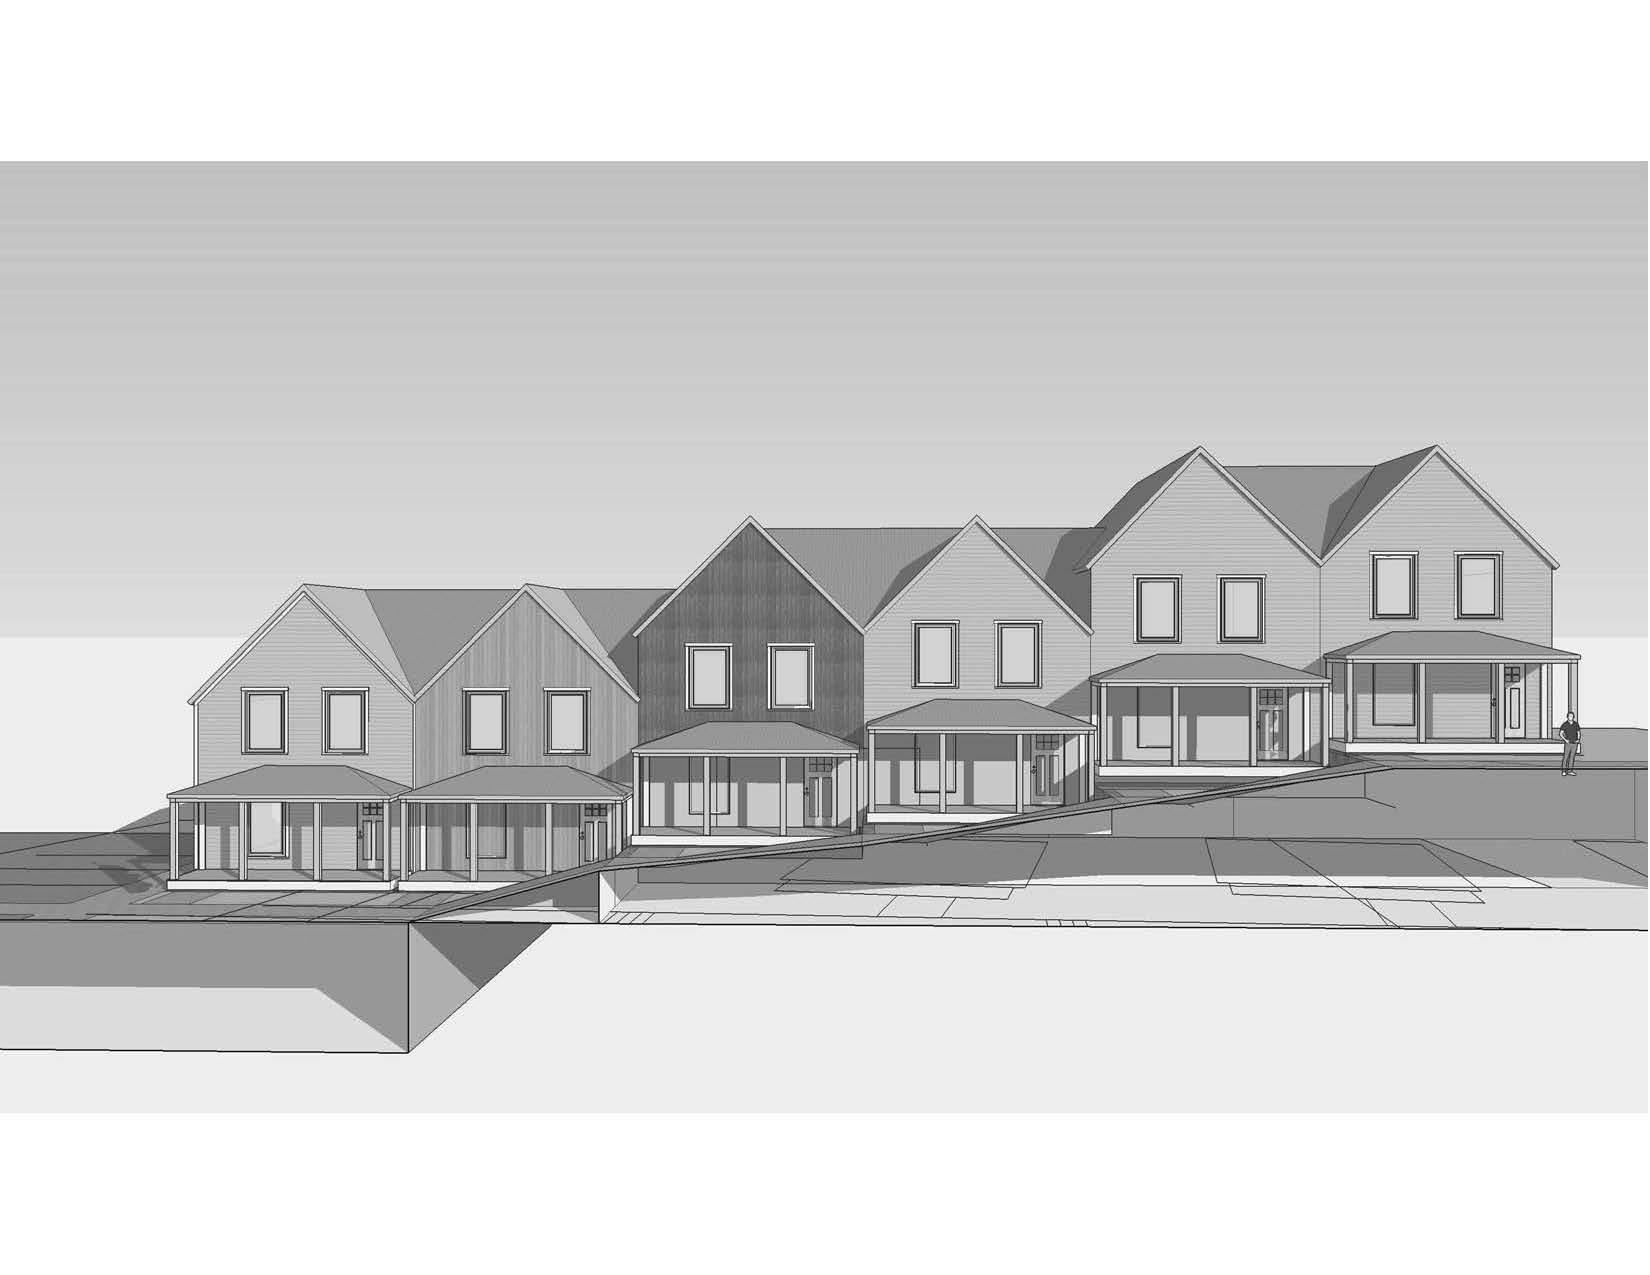 1712 brigham townhouse site rendered 9-1-2017 B&W 1_Page_4.jpg